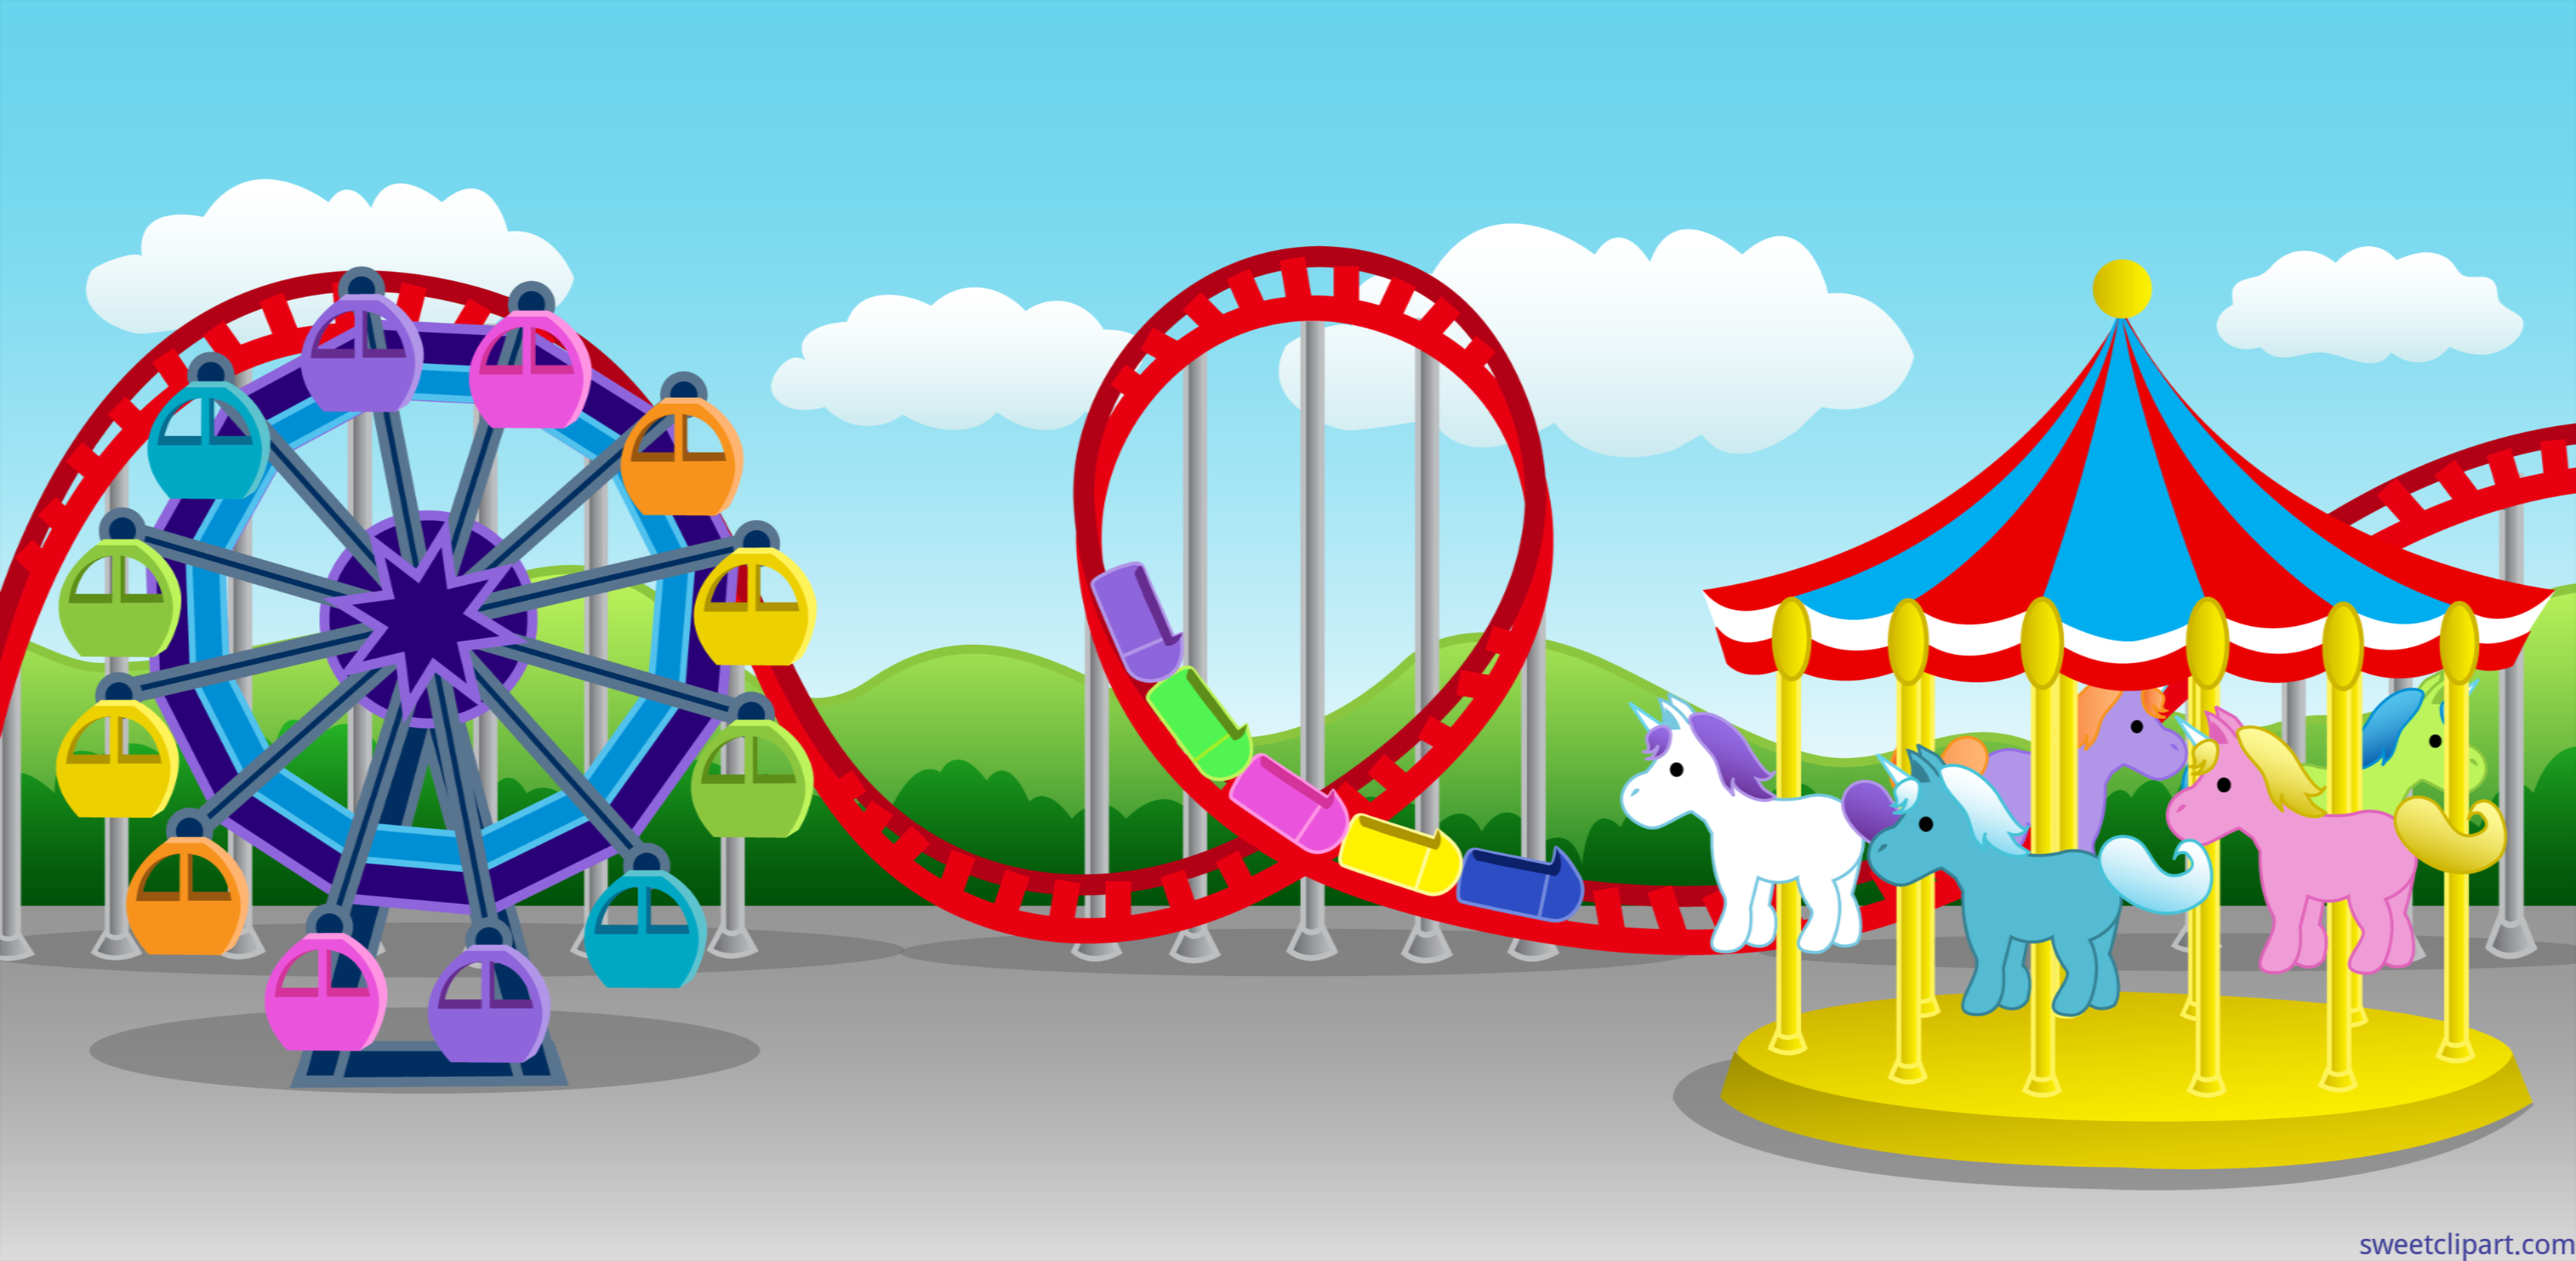 Carnival Amusement Park Setting Clip Art